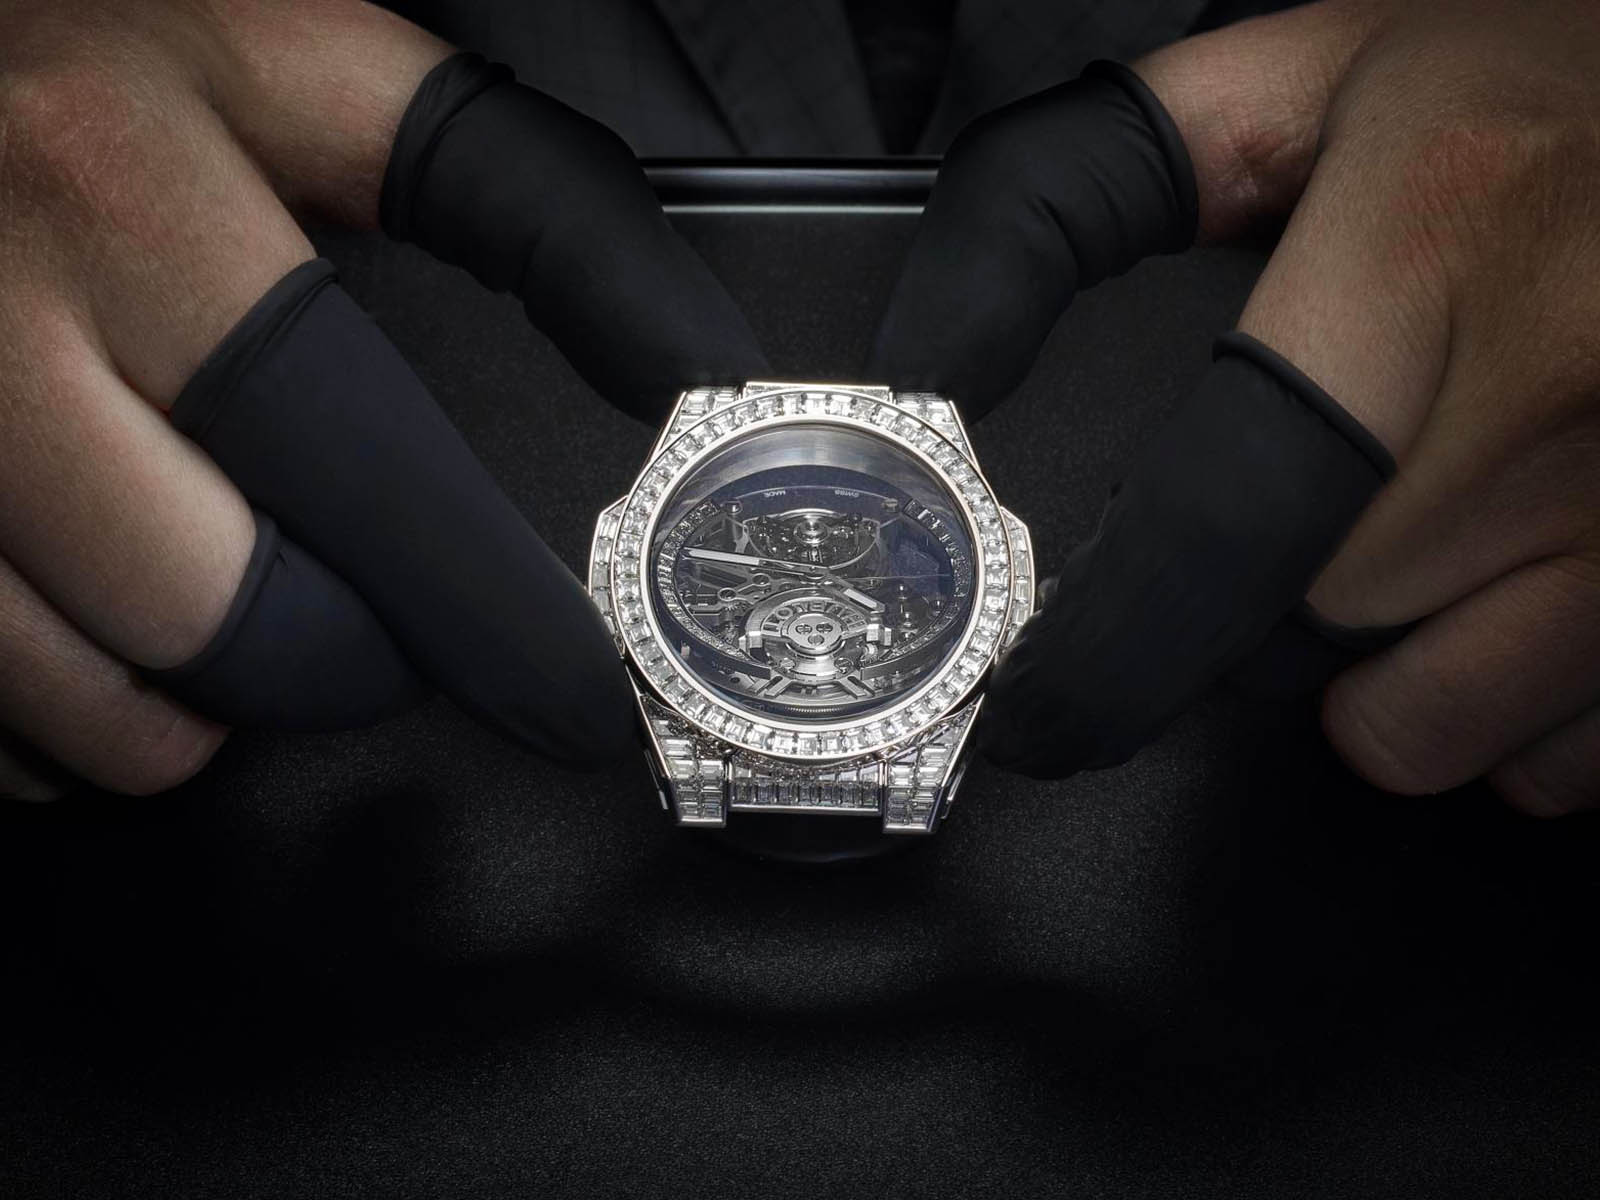 hublot-big-bang-integral-tourbillon-high-jewellery-2.jpg